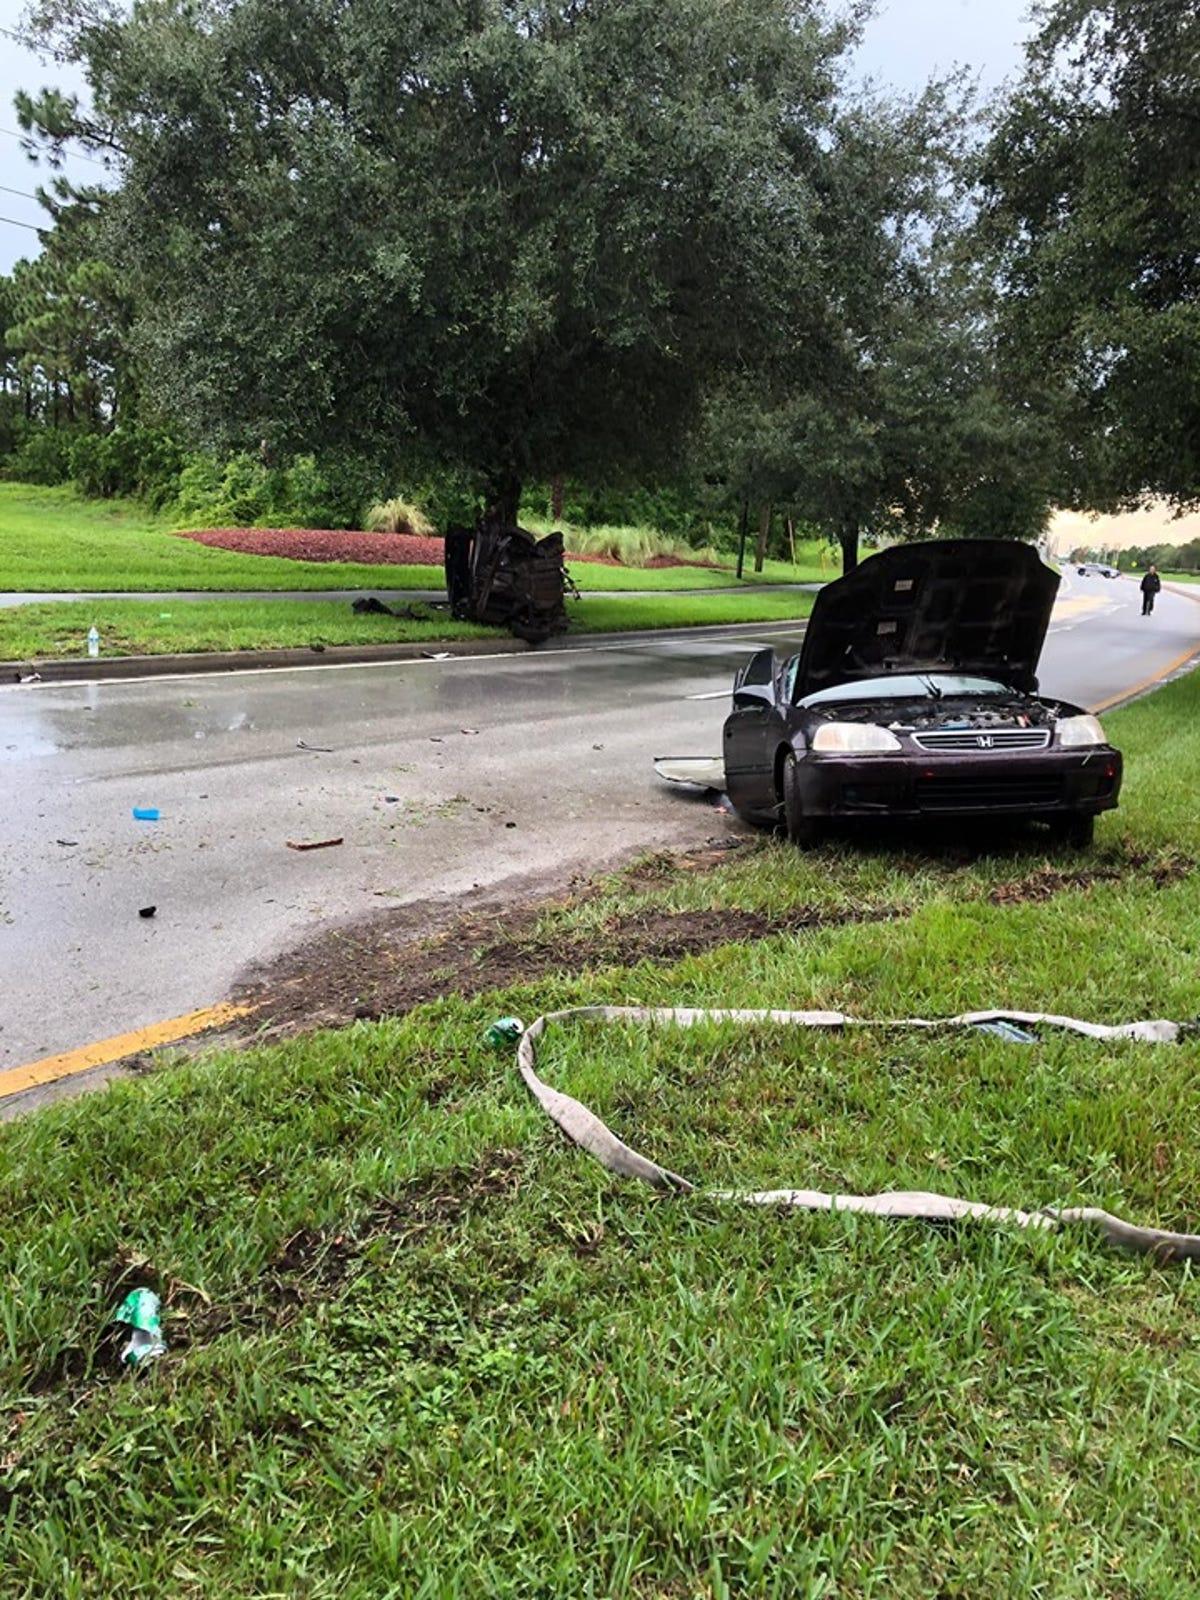 Two people survive Palm Bay crash involving oak tree